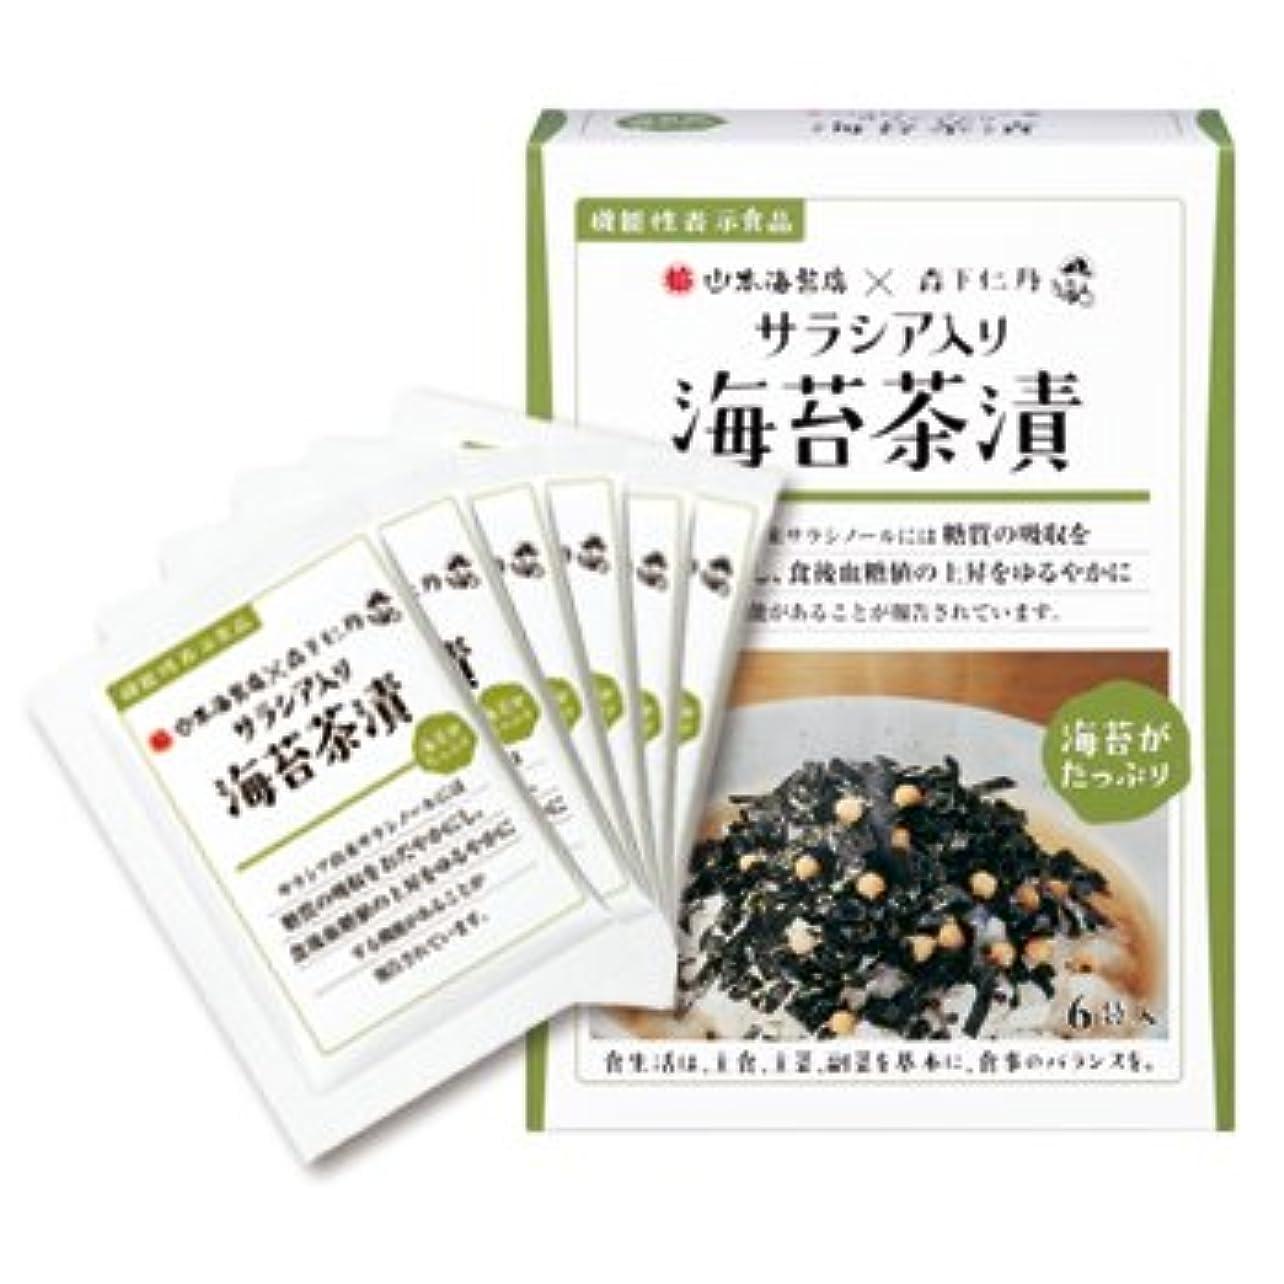 支出確立登山家海苔茶漬 サラシア入り 1箱(6袋入) [機能性表示食品]